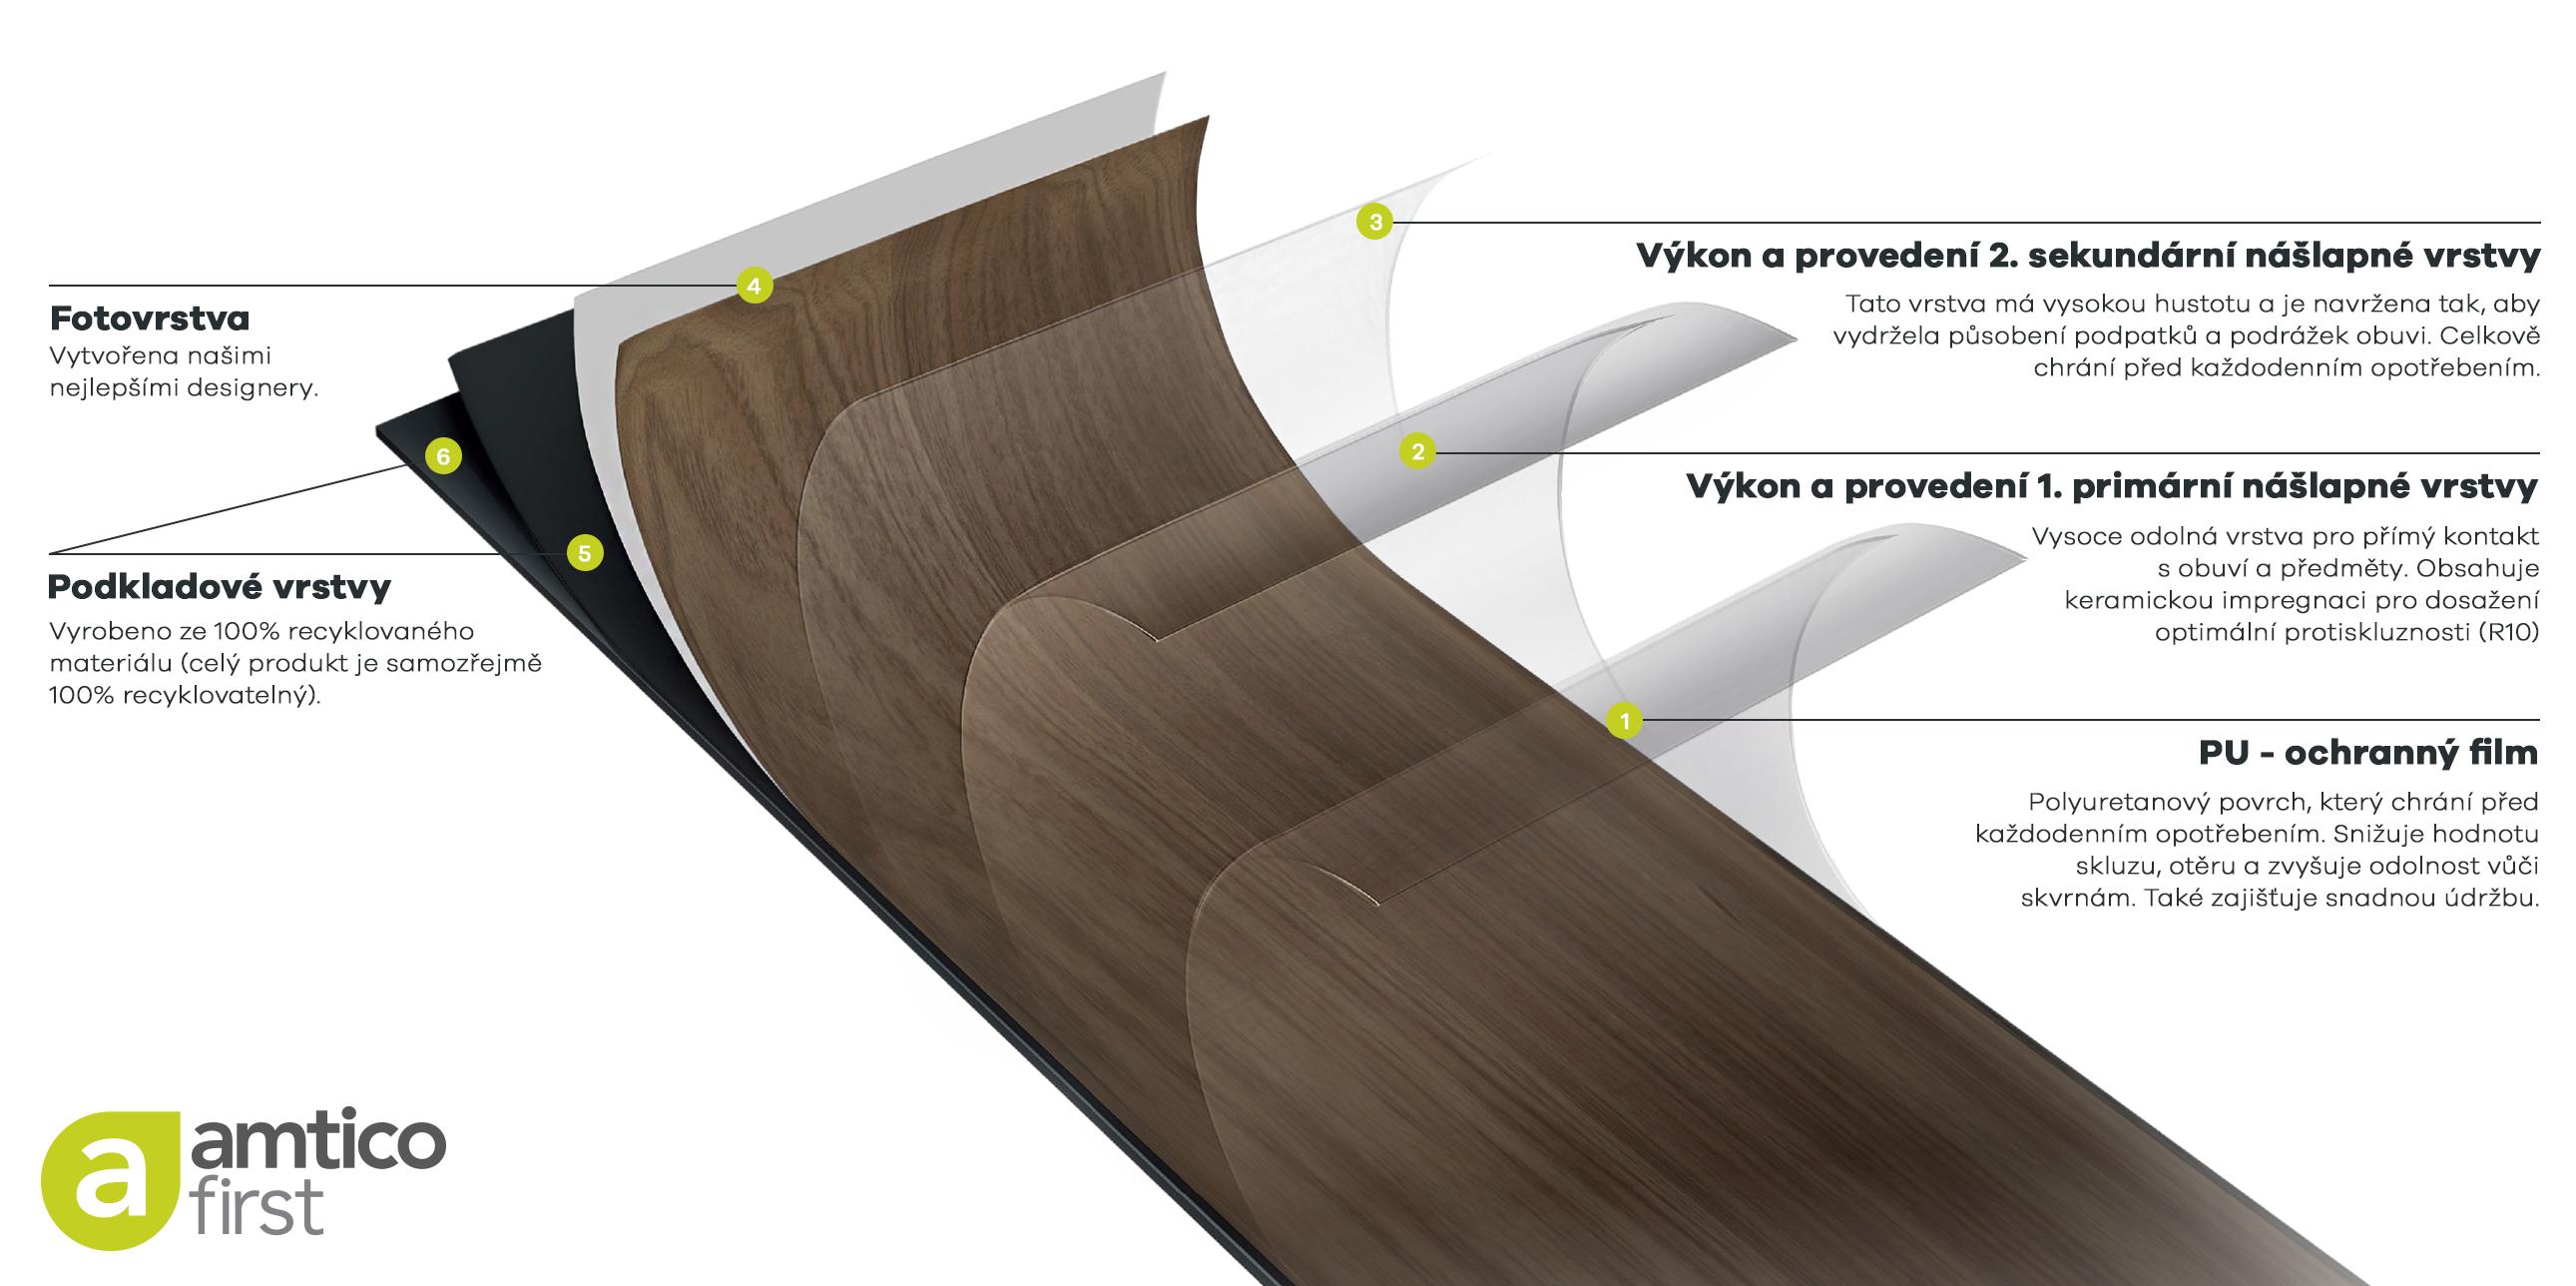 AMTICO FIRST - vinylová podlaha - struktura